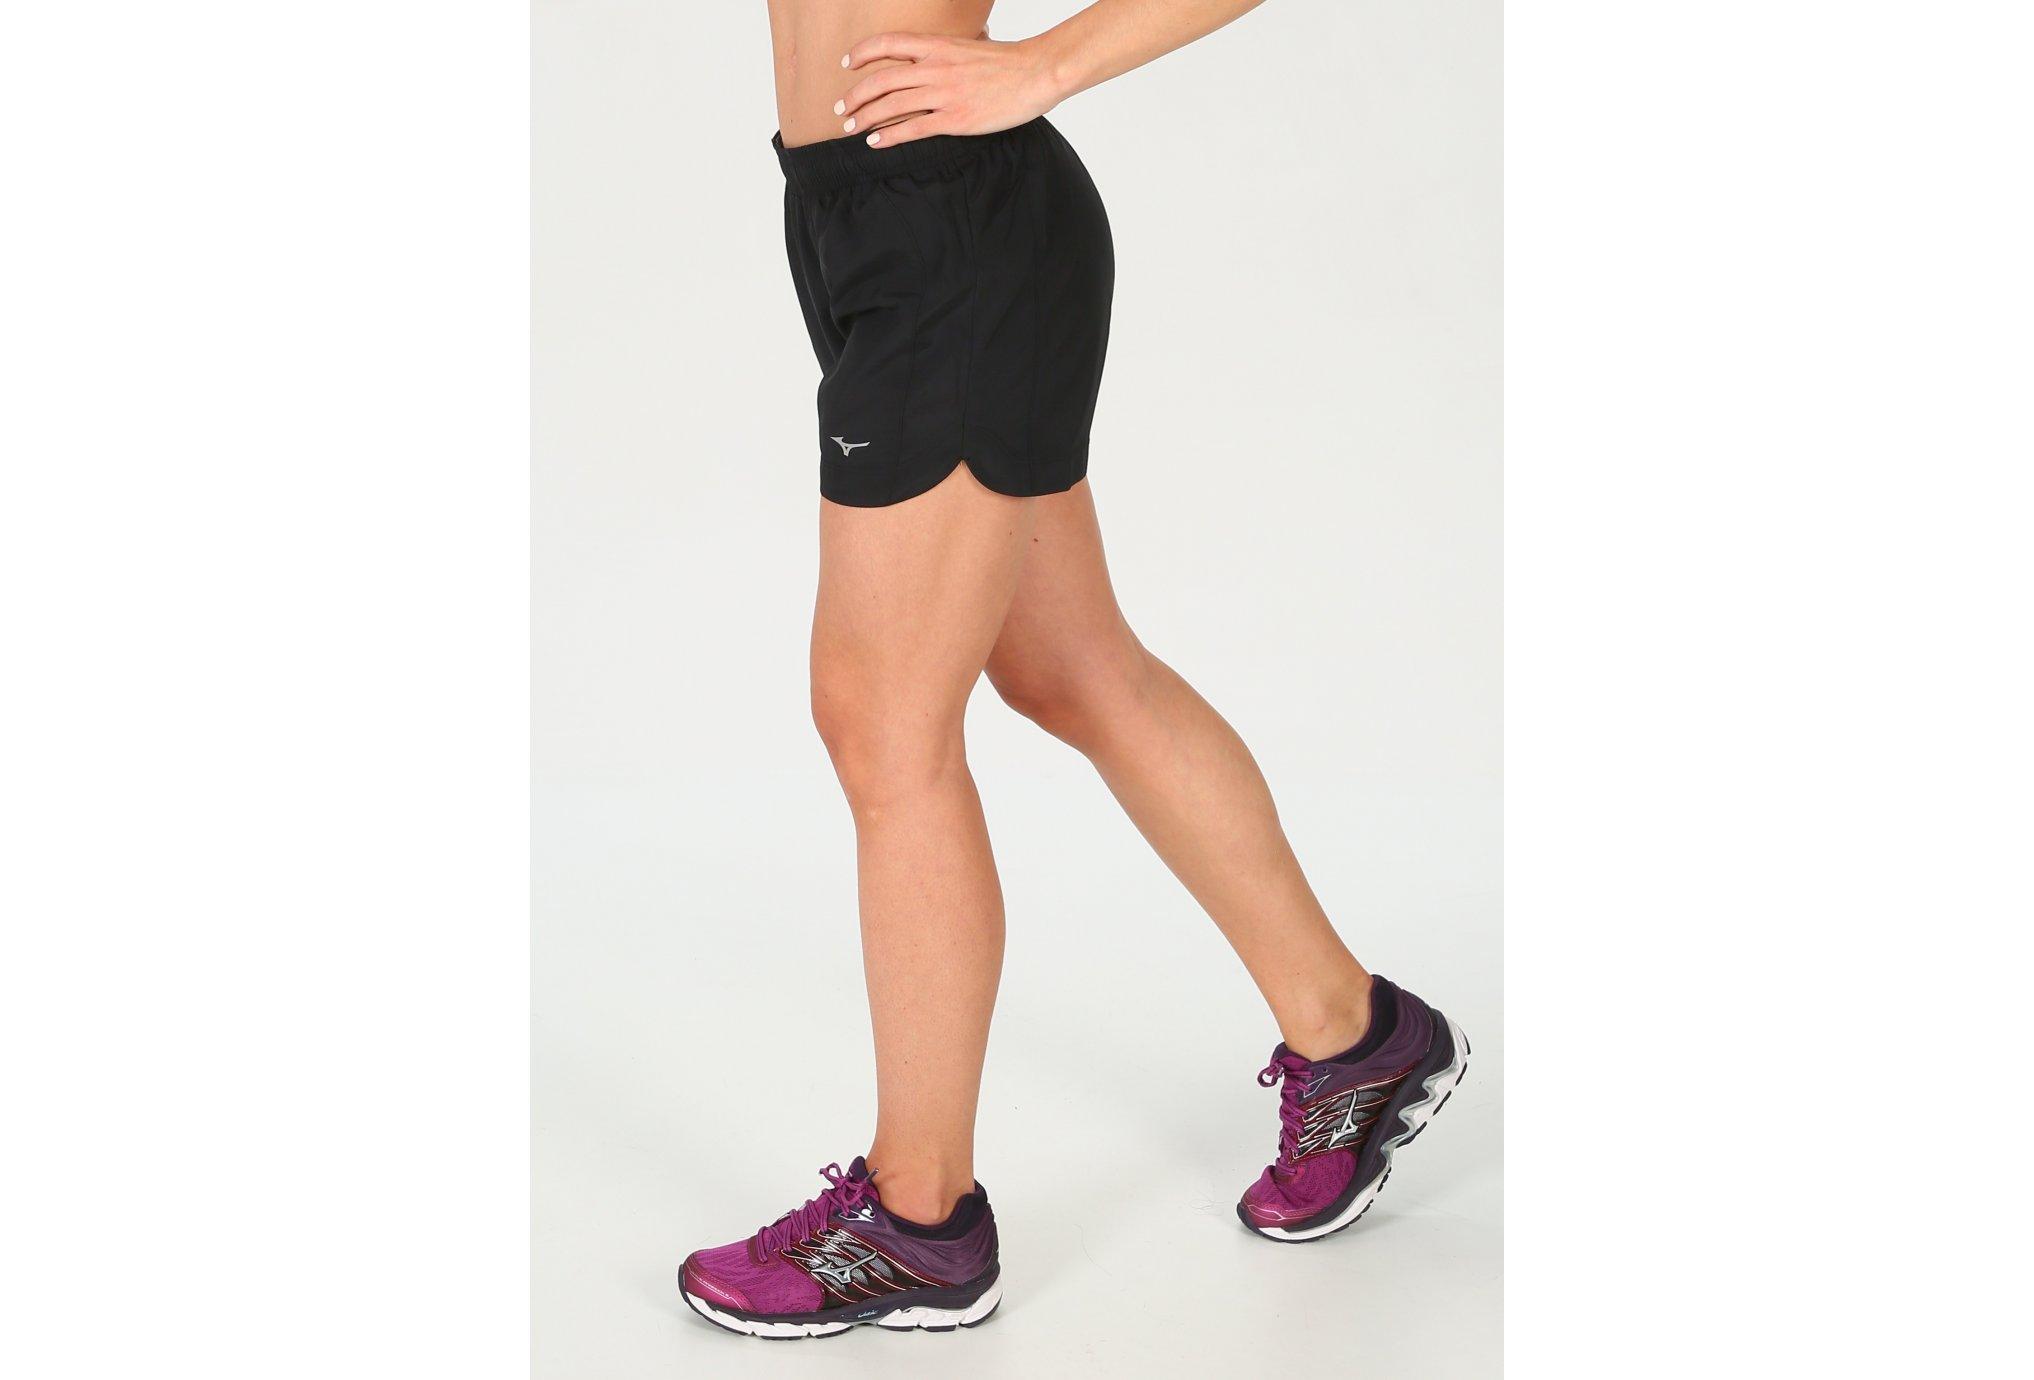 Mizuno DryLite Core Square 5.5 W vêtement running femme